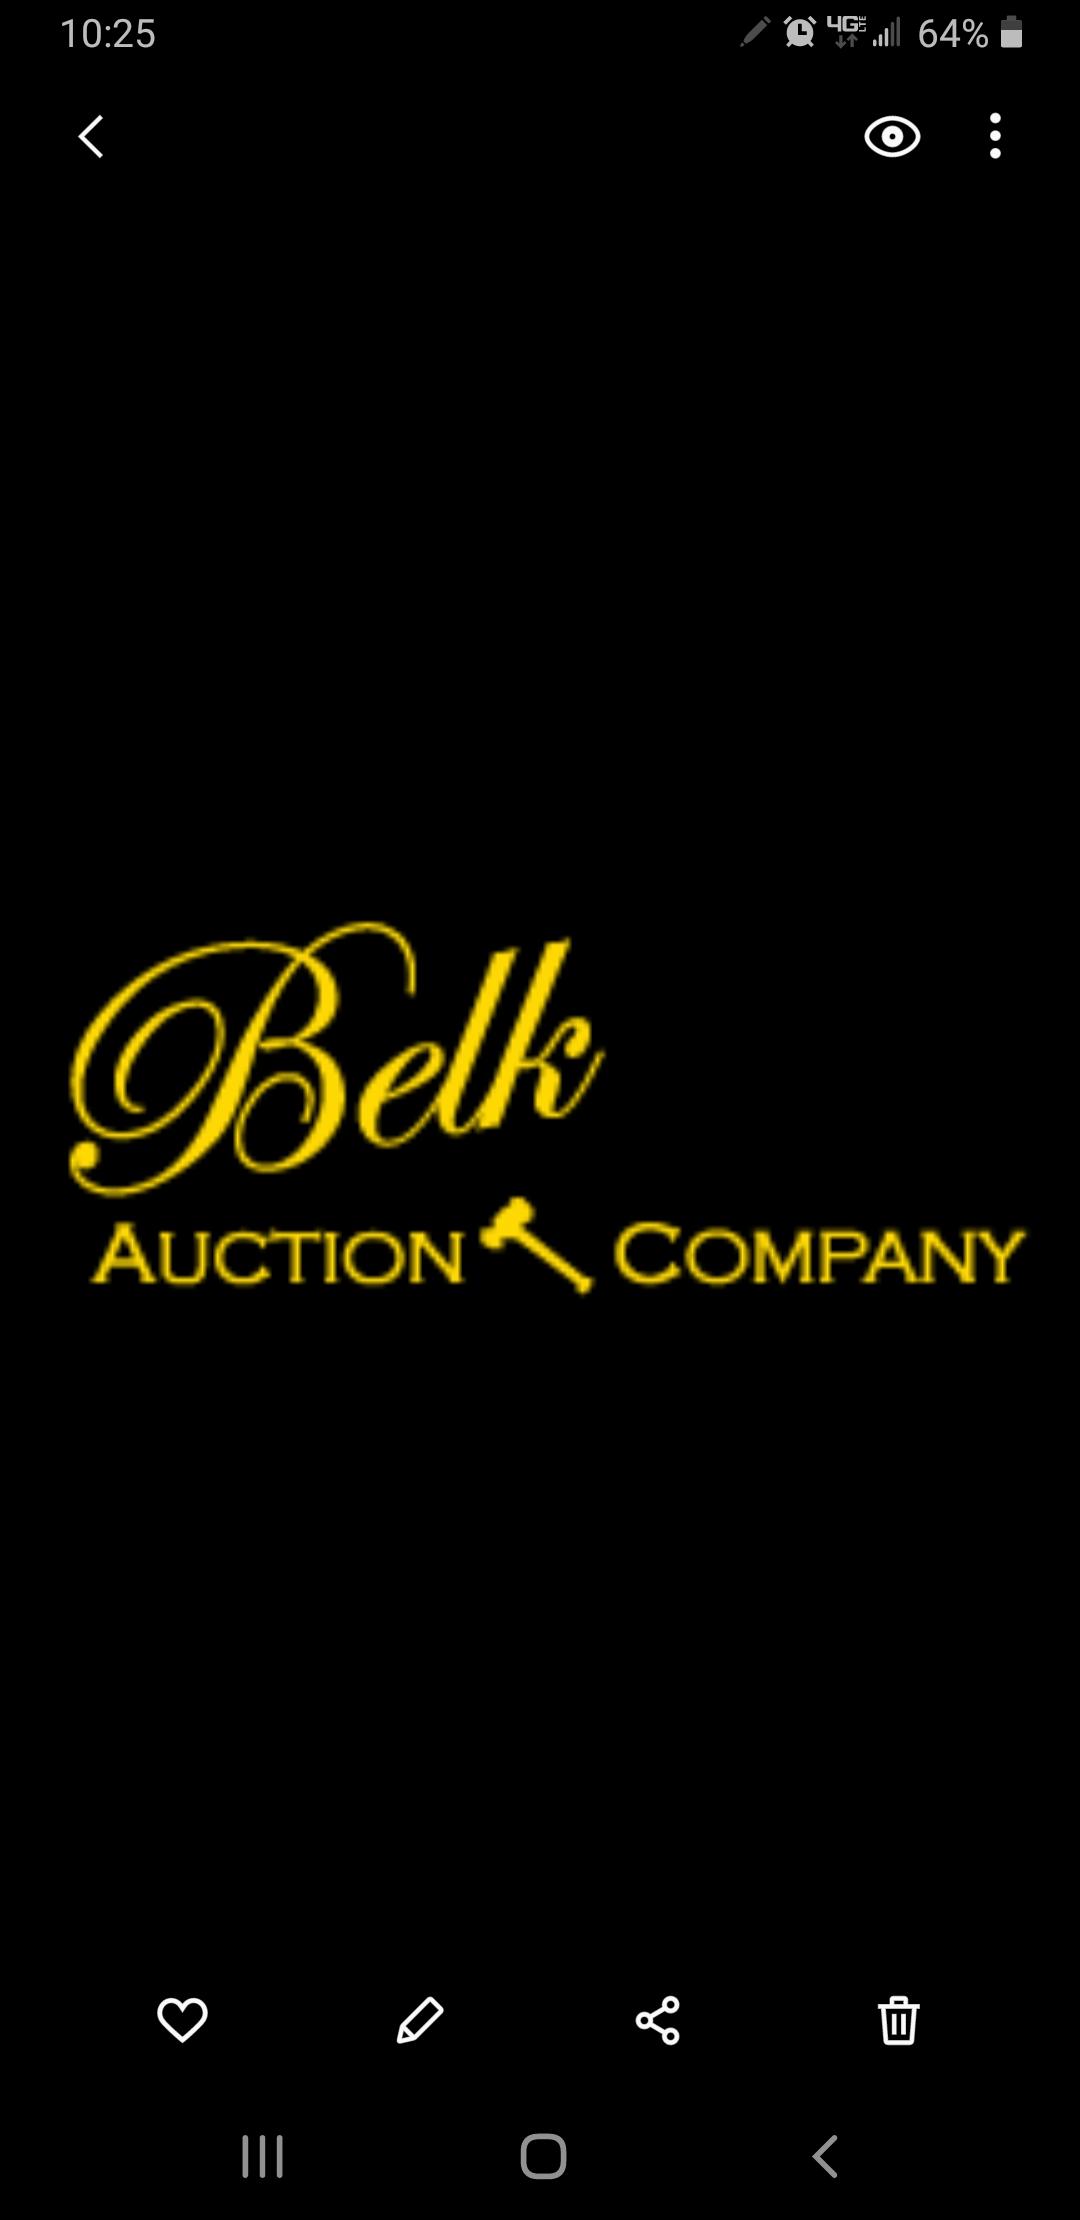 Belk Auction Company